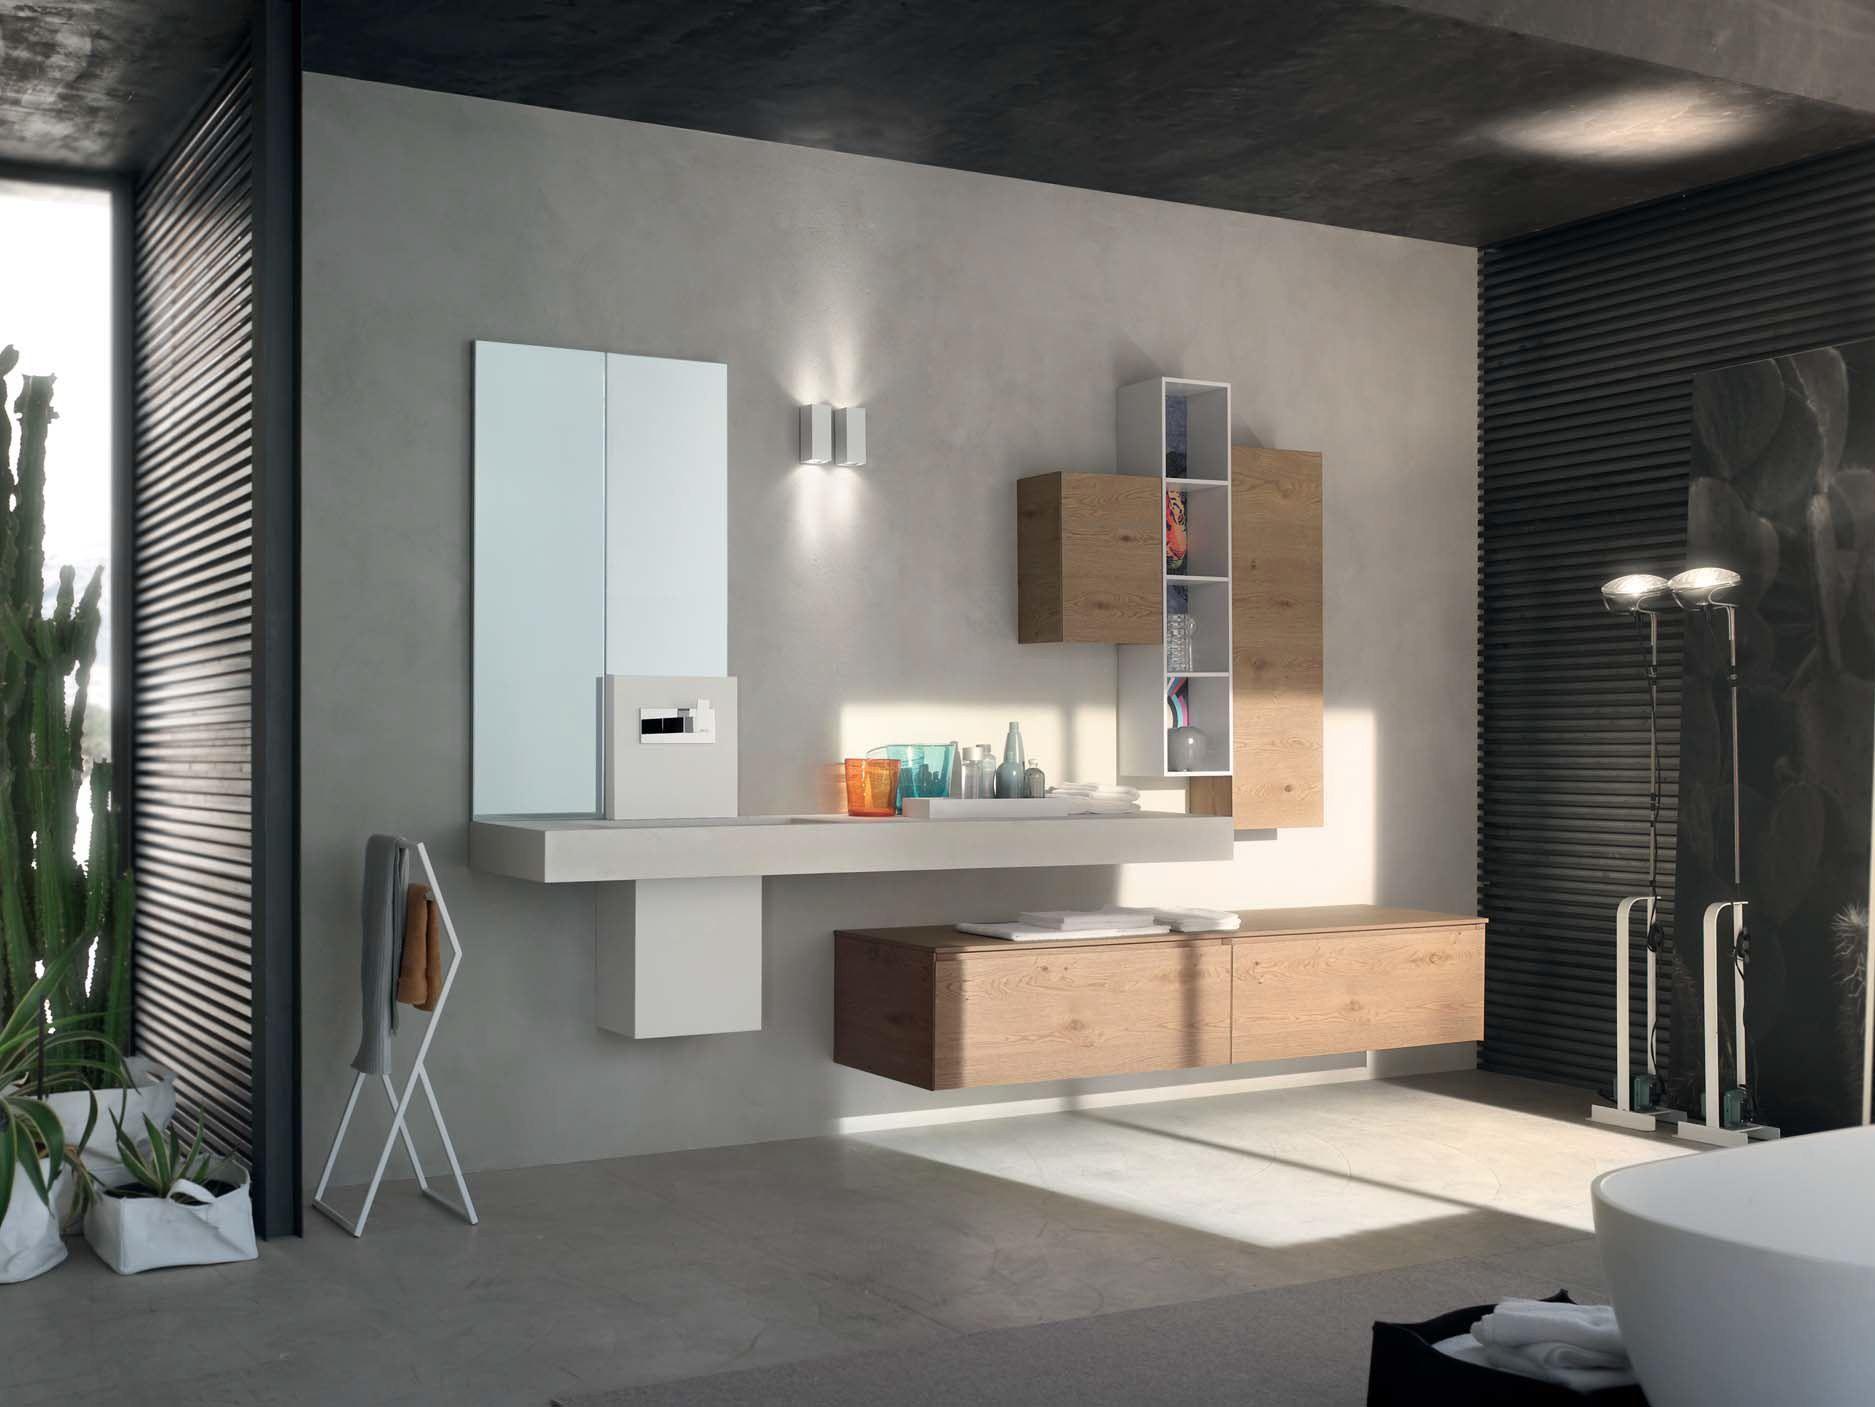 Oak Bathroom Cabinet / Vanity Unit LA FENICE   COMPOSITION 15 La Fenice  Collection By Arcom